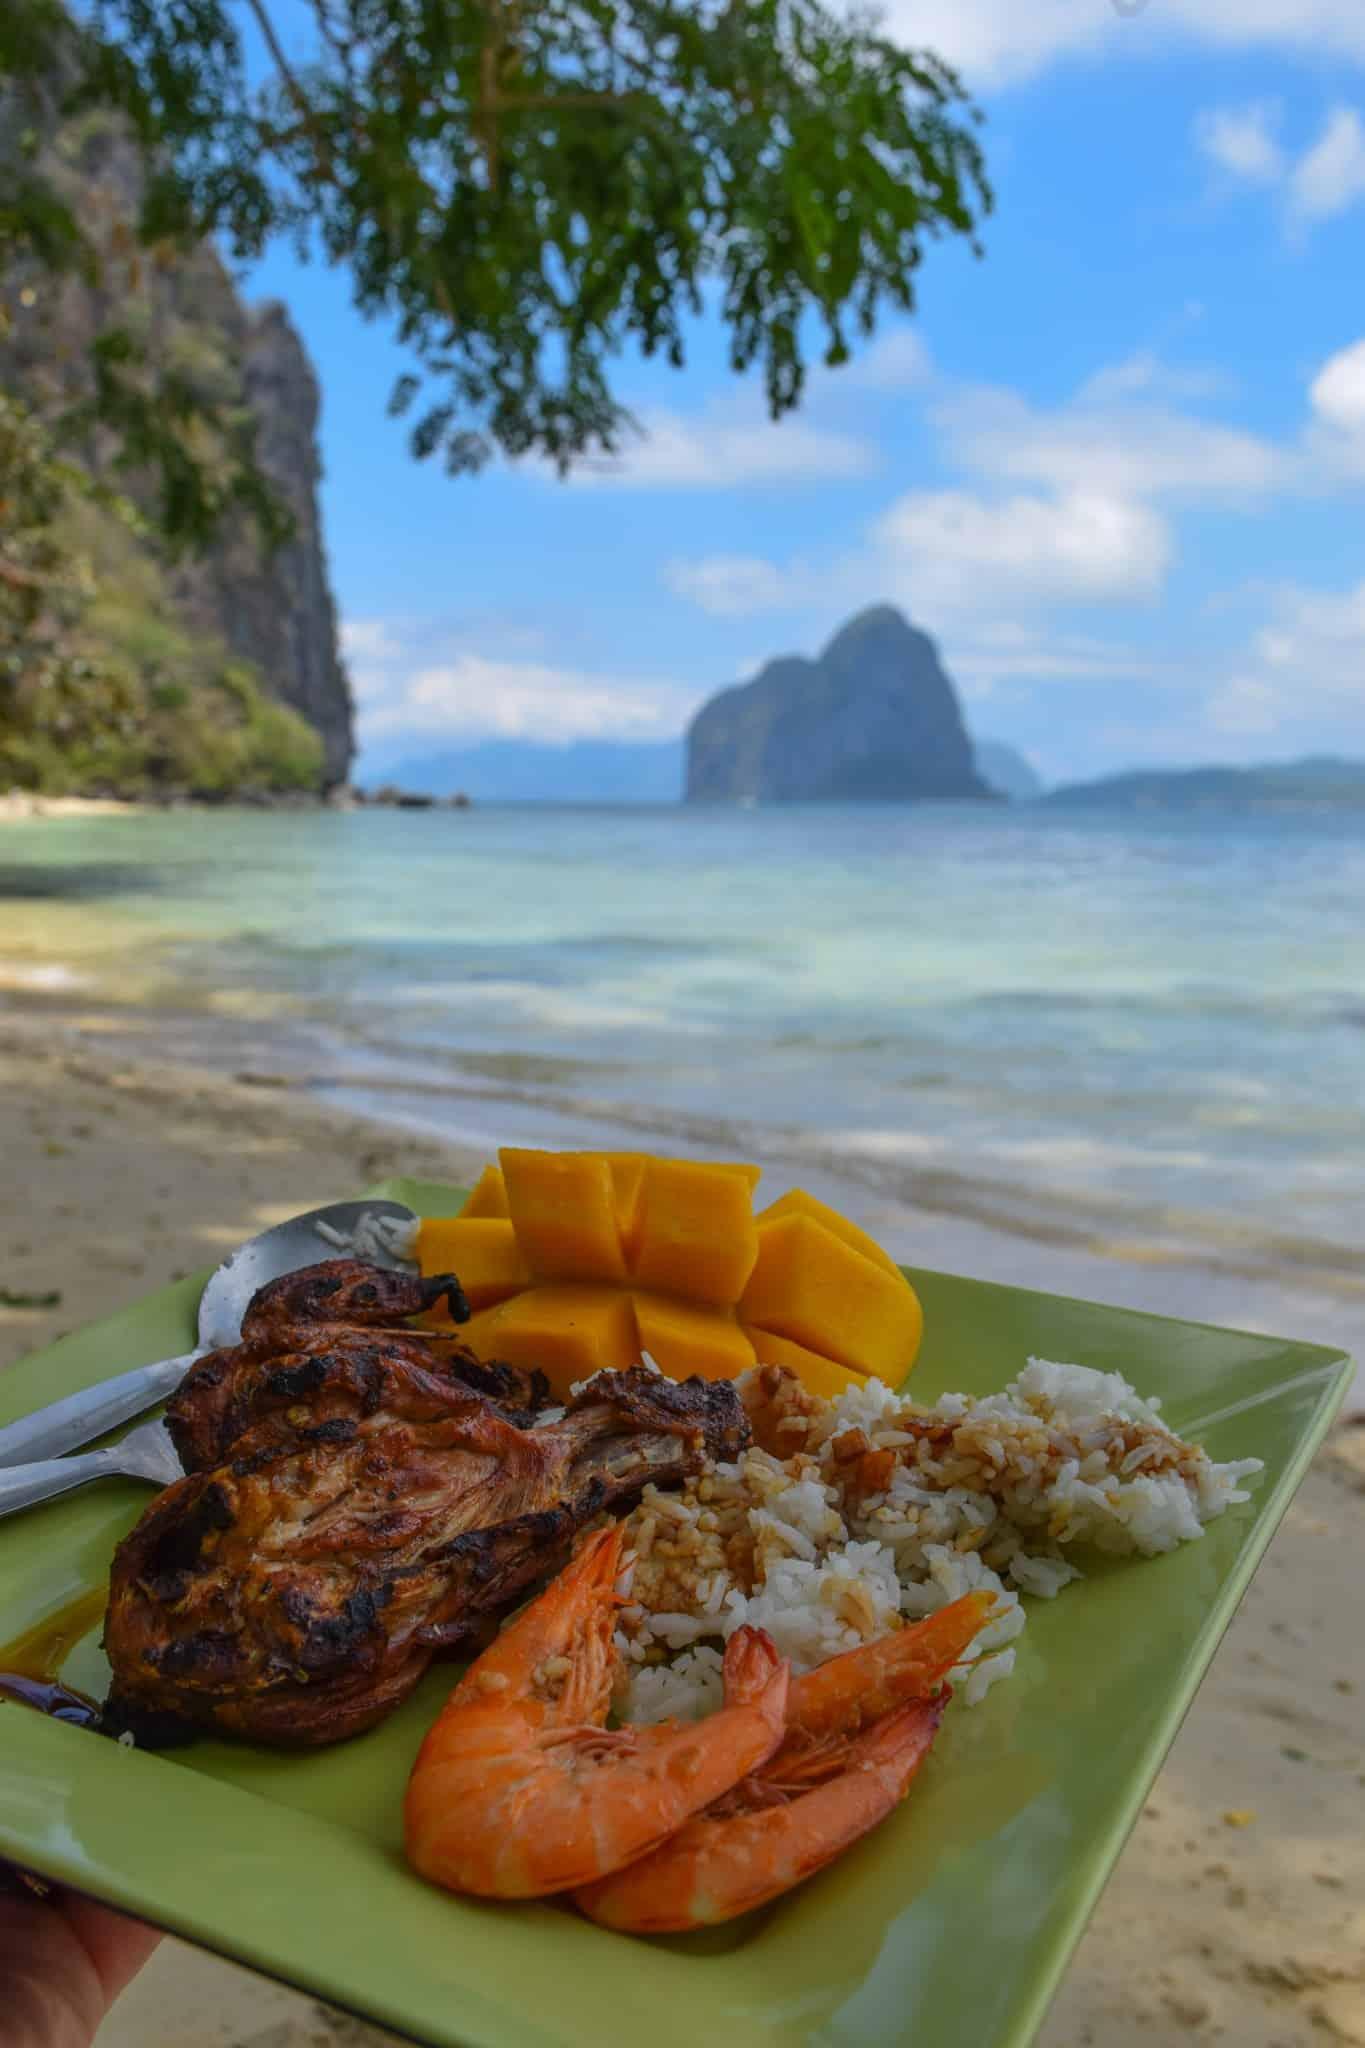 Lunch El Nido Palawan Philippines